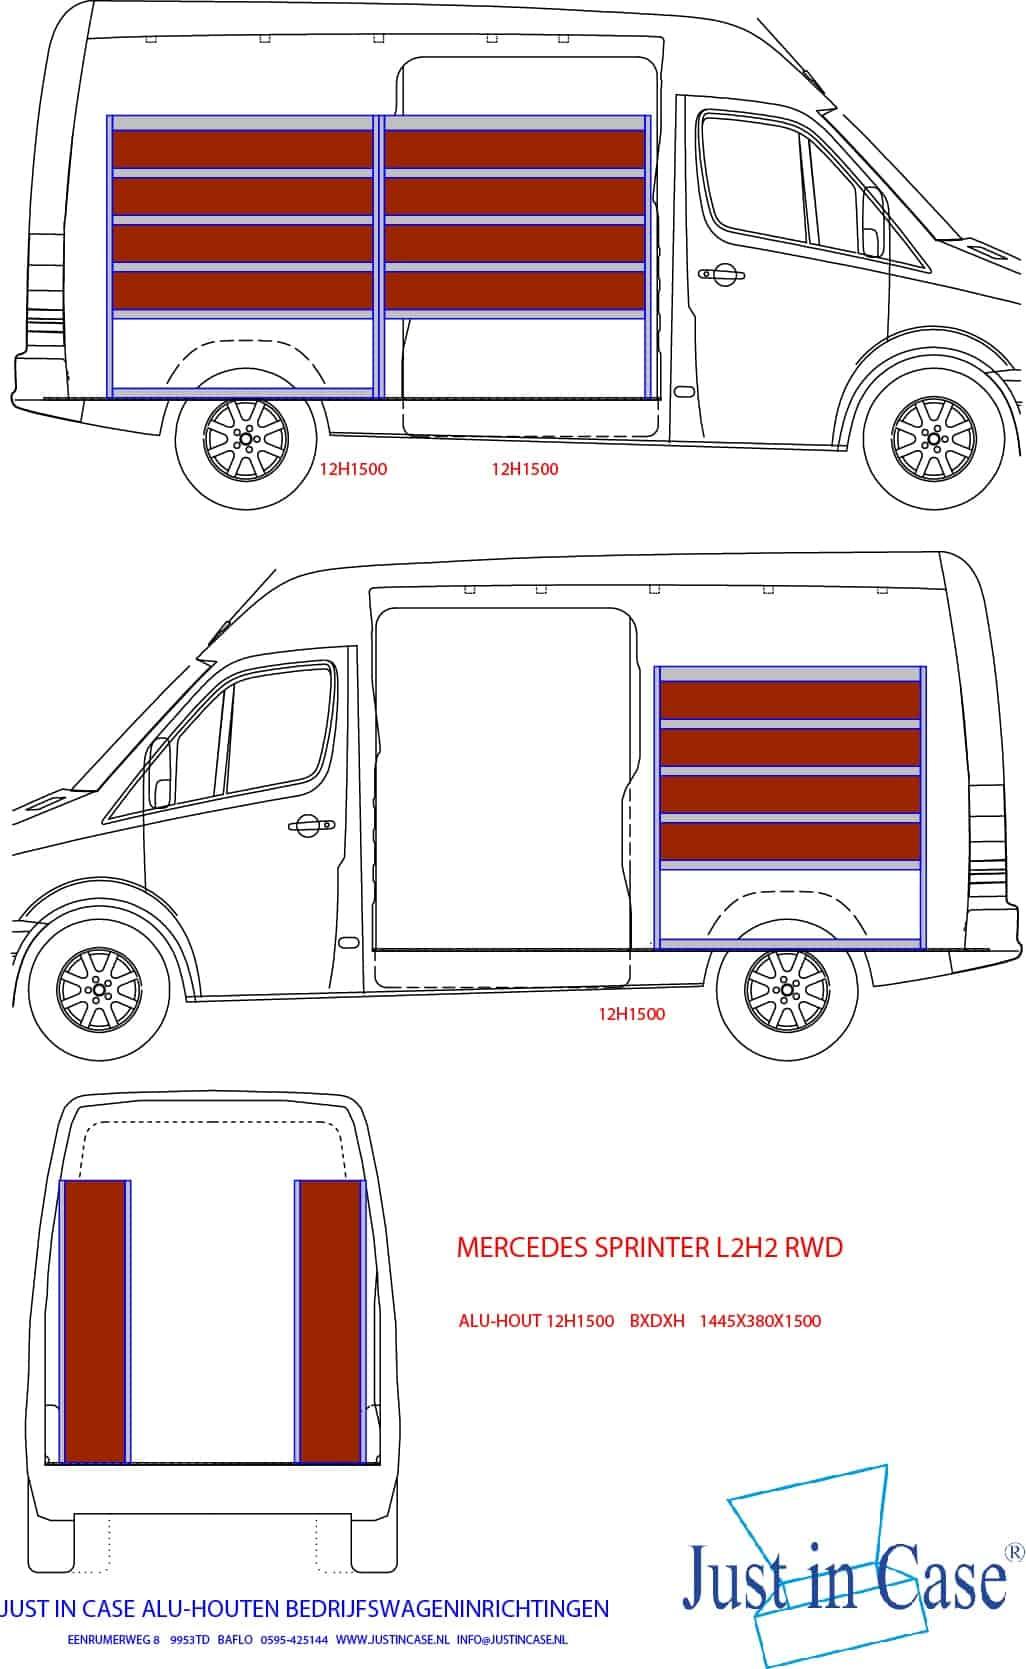 Mercedes Sprinter (L2) Bedrijfswagen inrichting schets